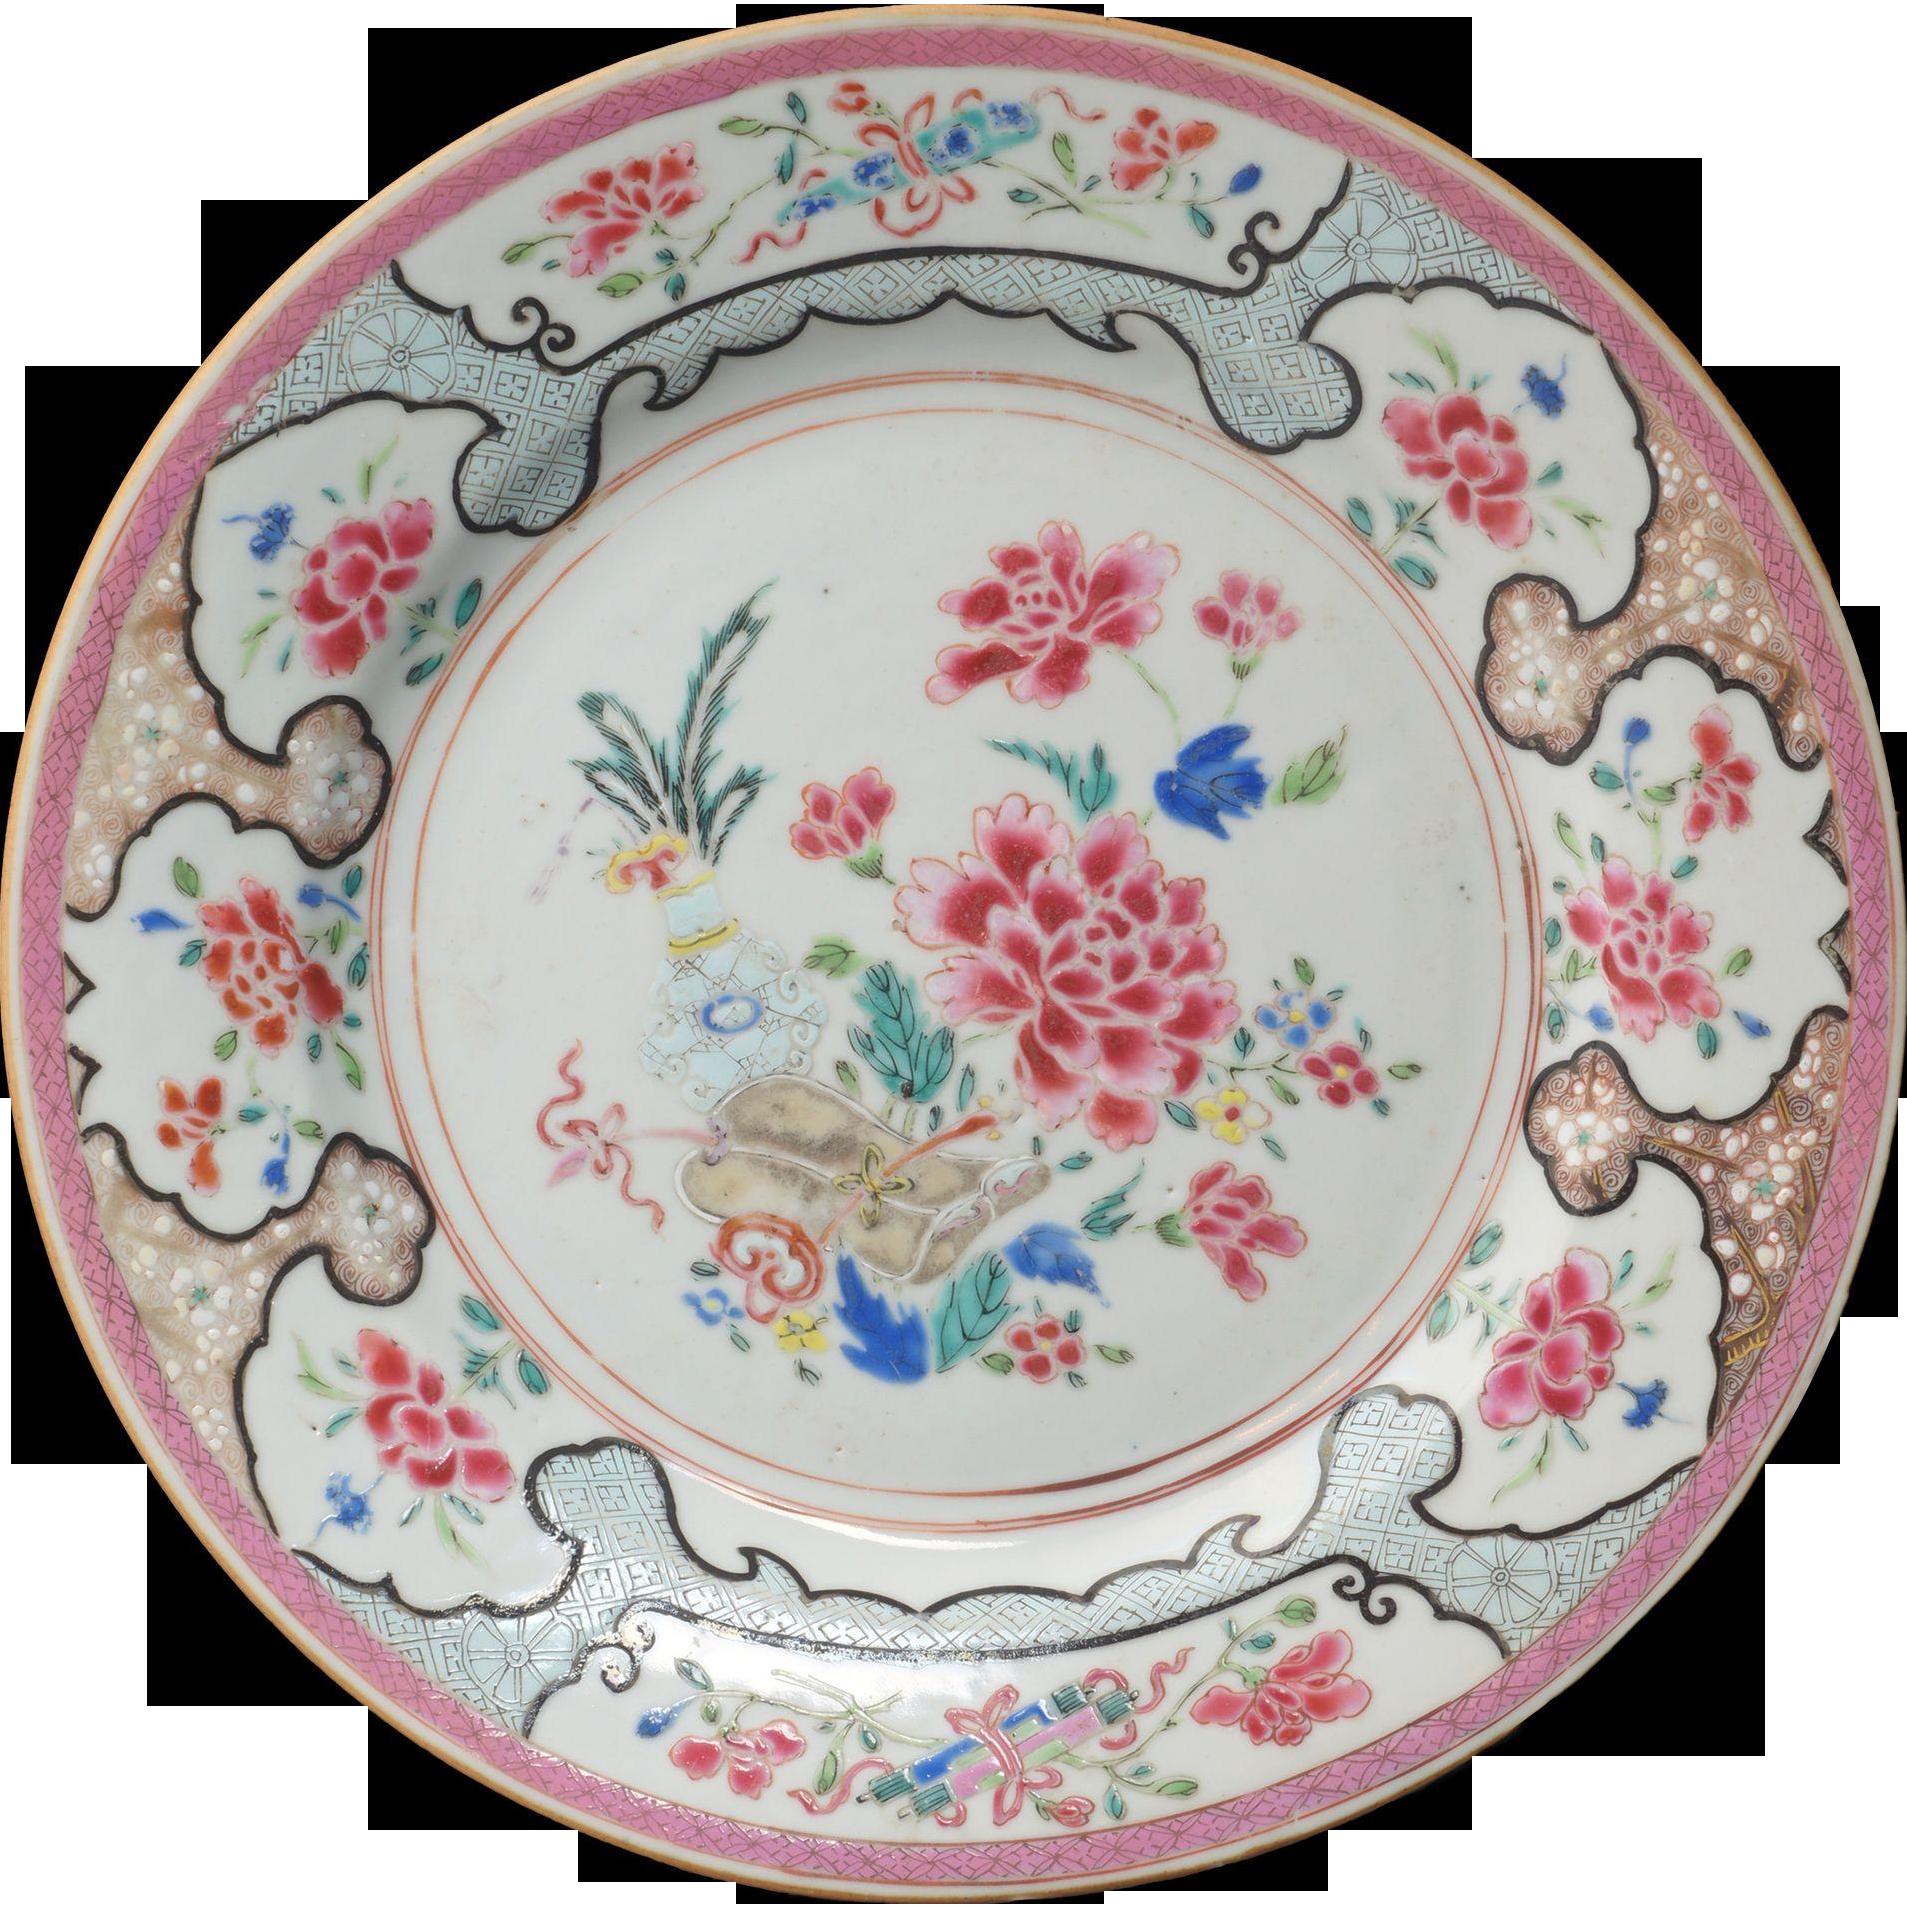 Chinese Porcelain Plates : Chinese export over glaze enamel famille rose porcelain